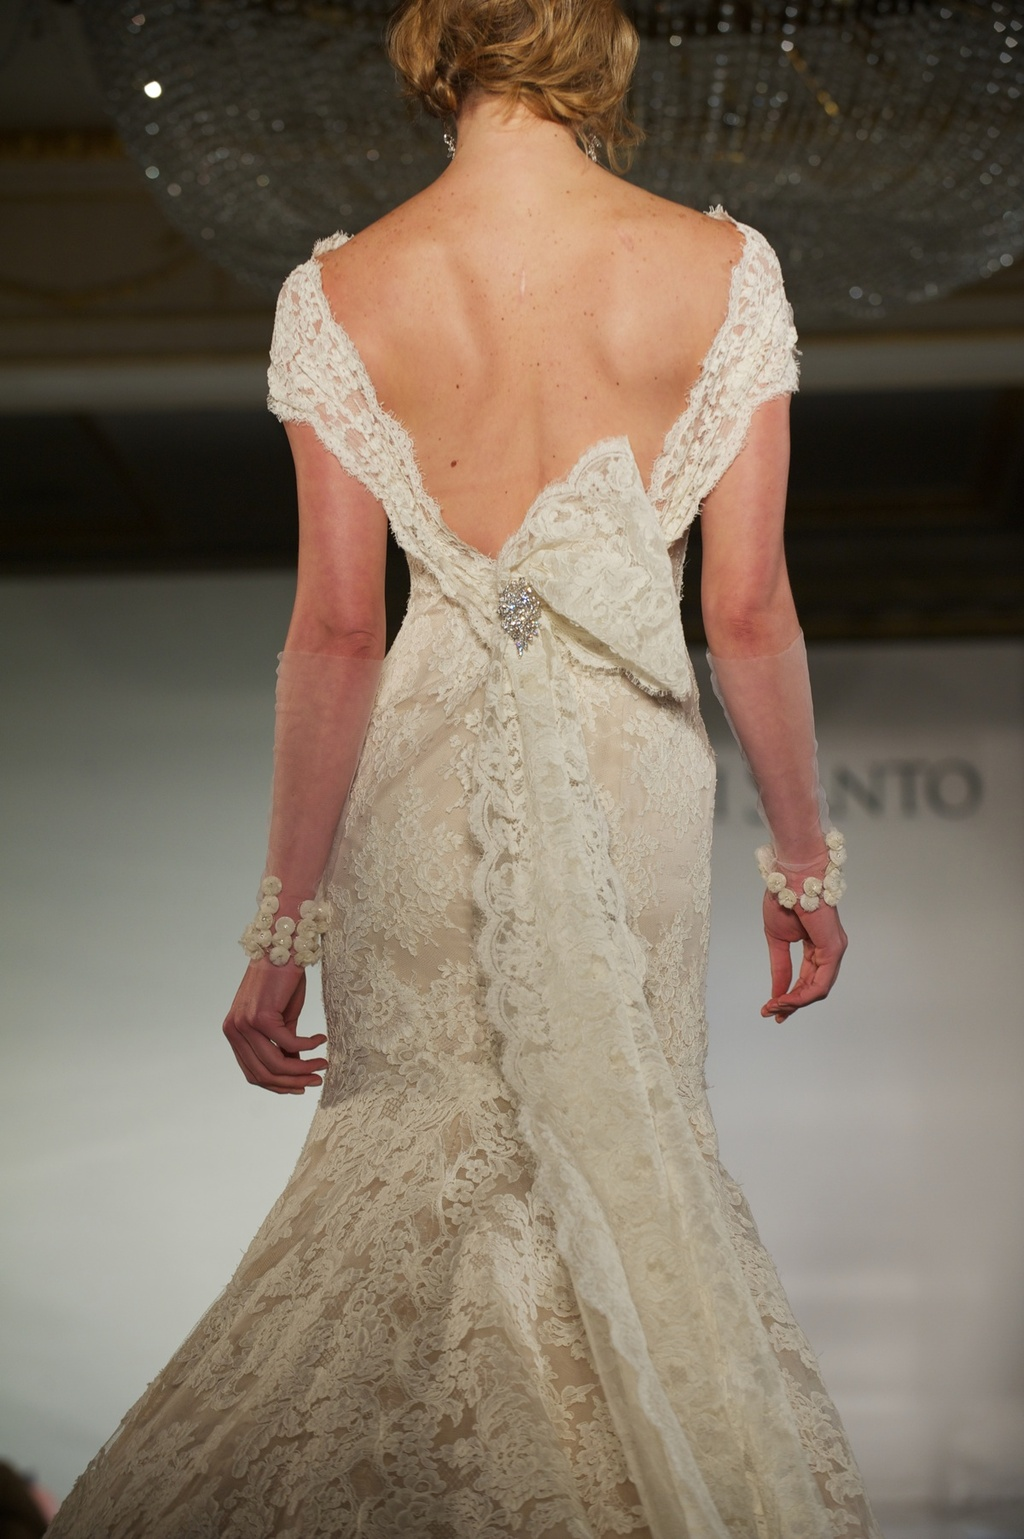 Ines-di-santo-wedding-dress-2012-bridal-gowns-19.full